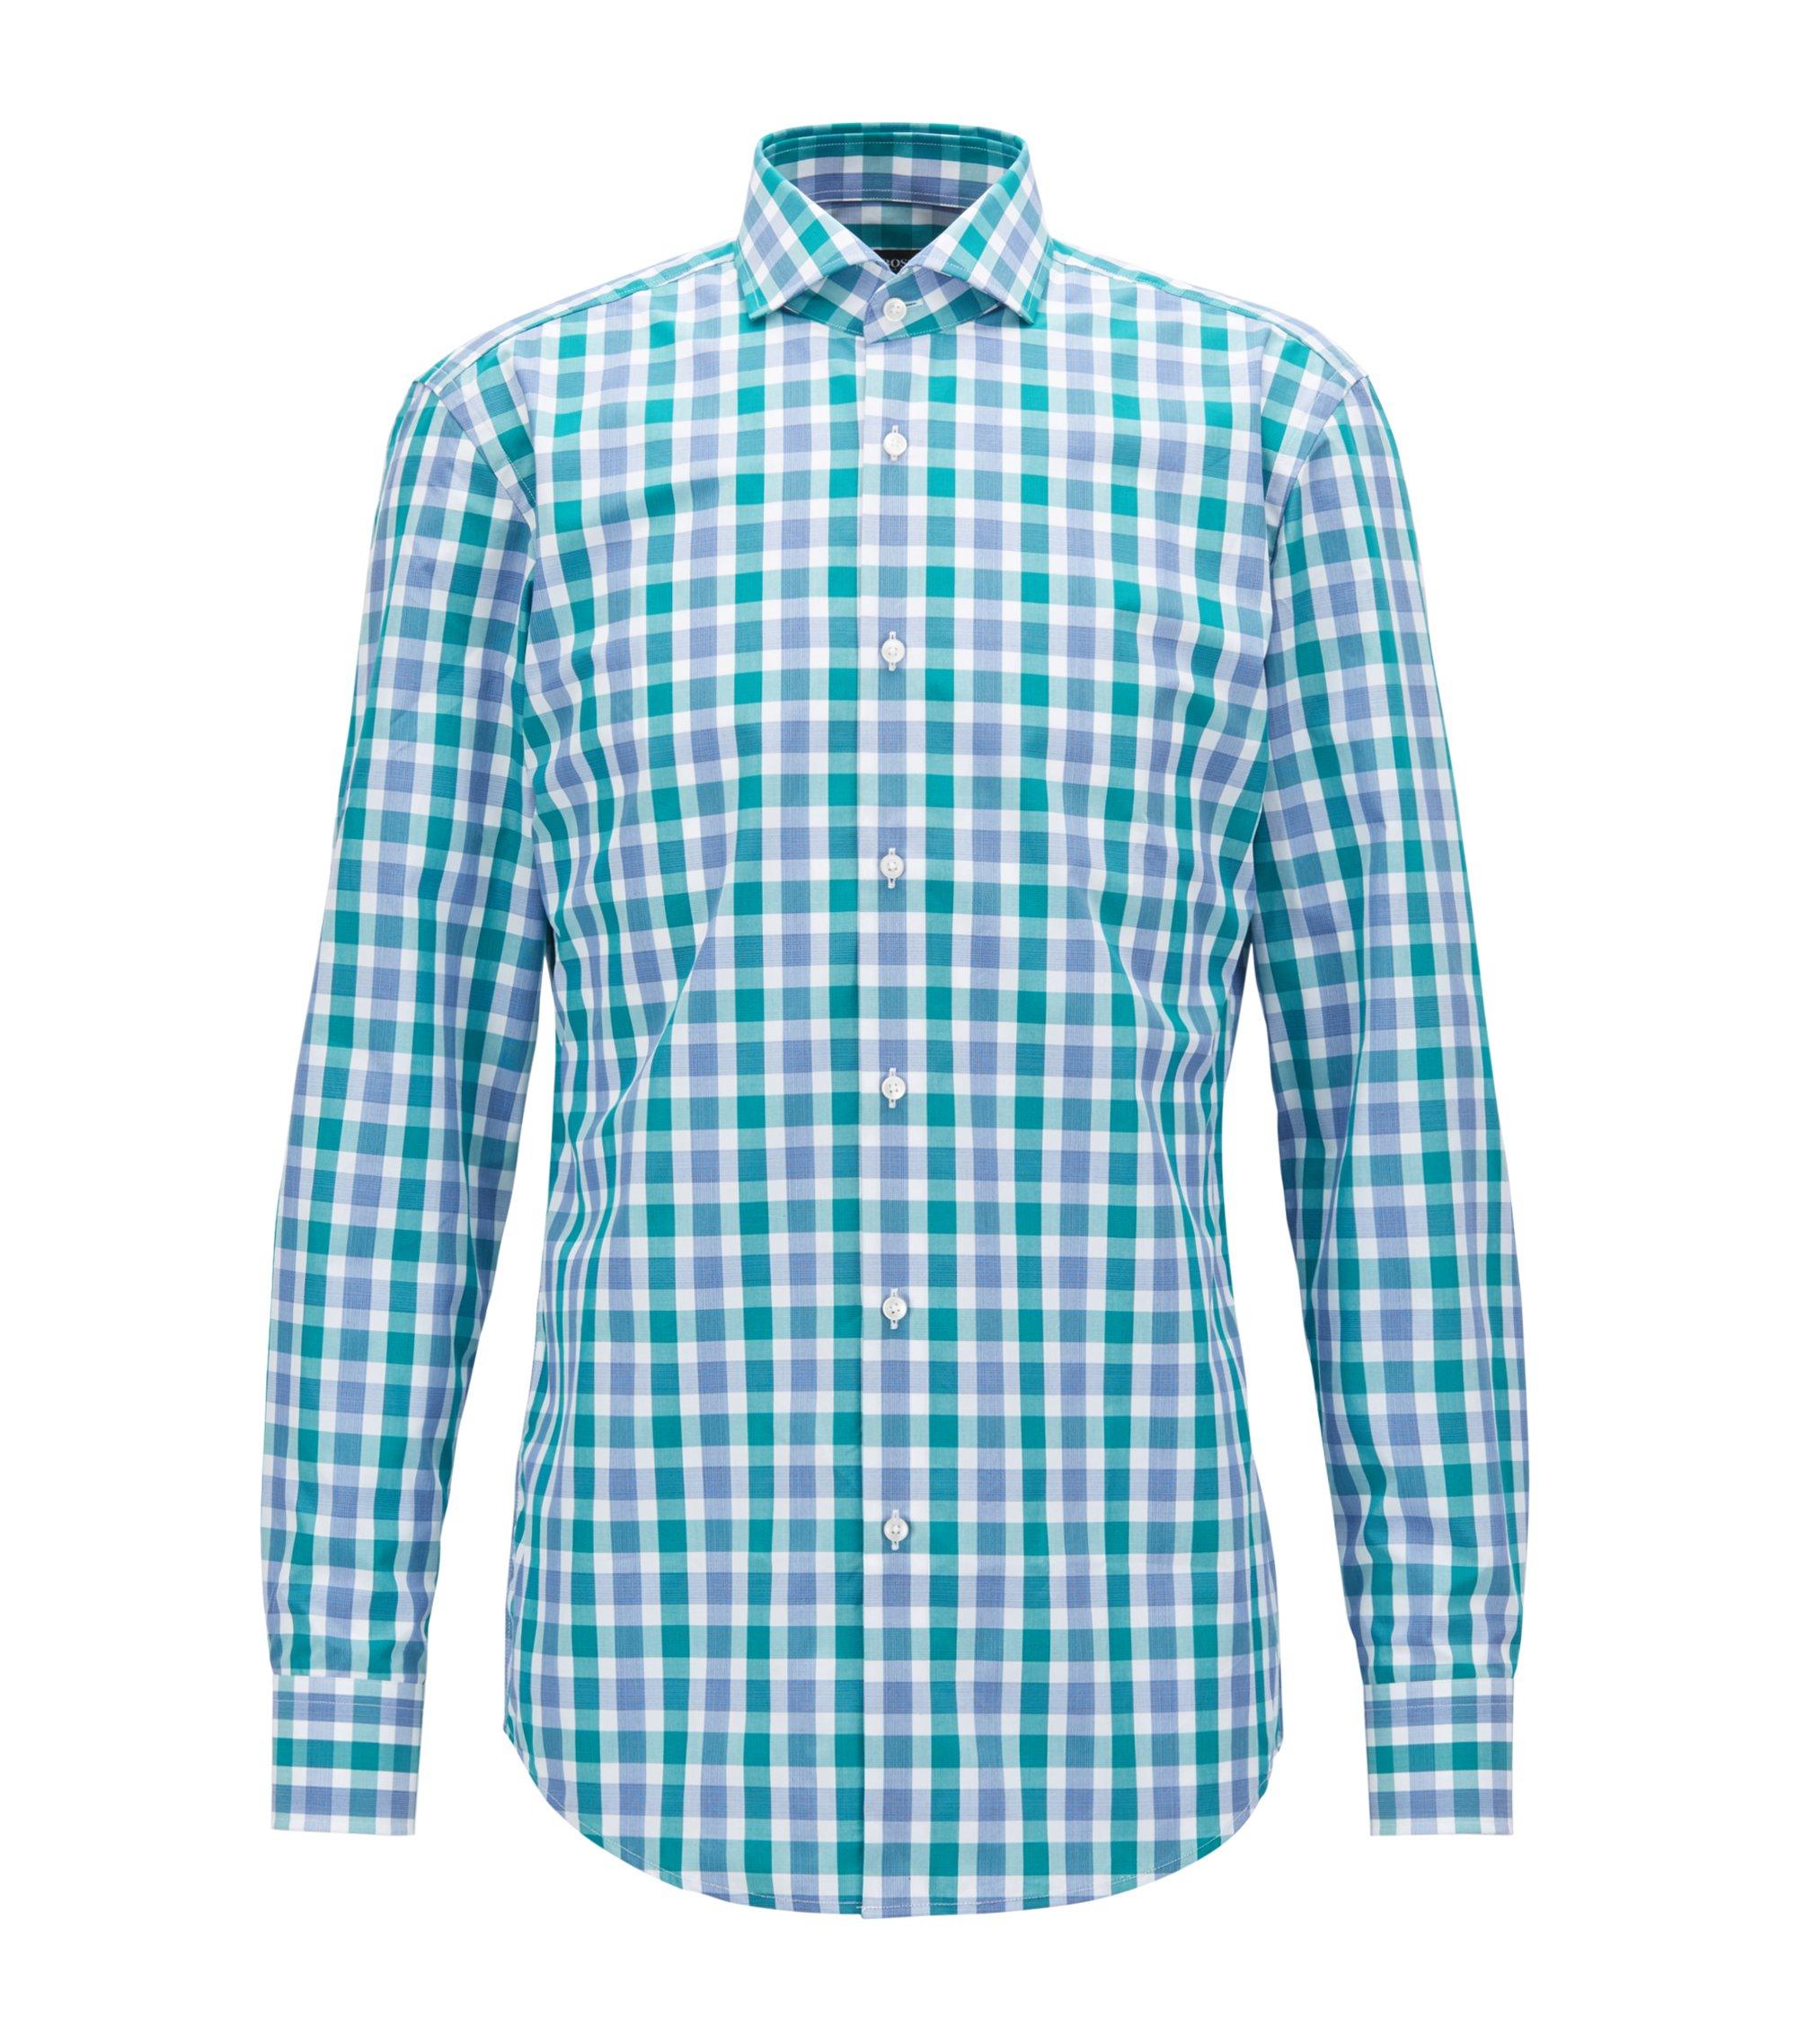 Slim-fit shirt in Vichy-check cotton poplin, Green